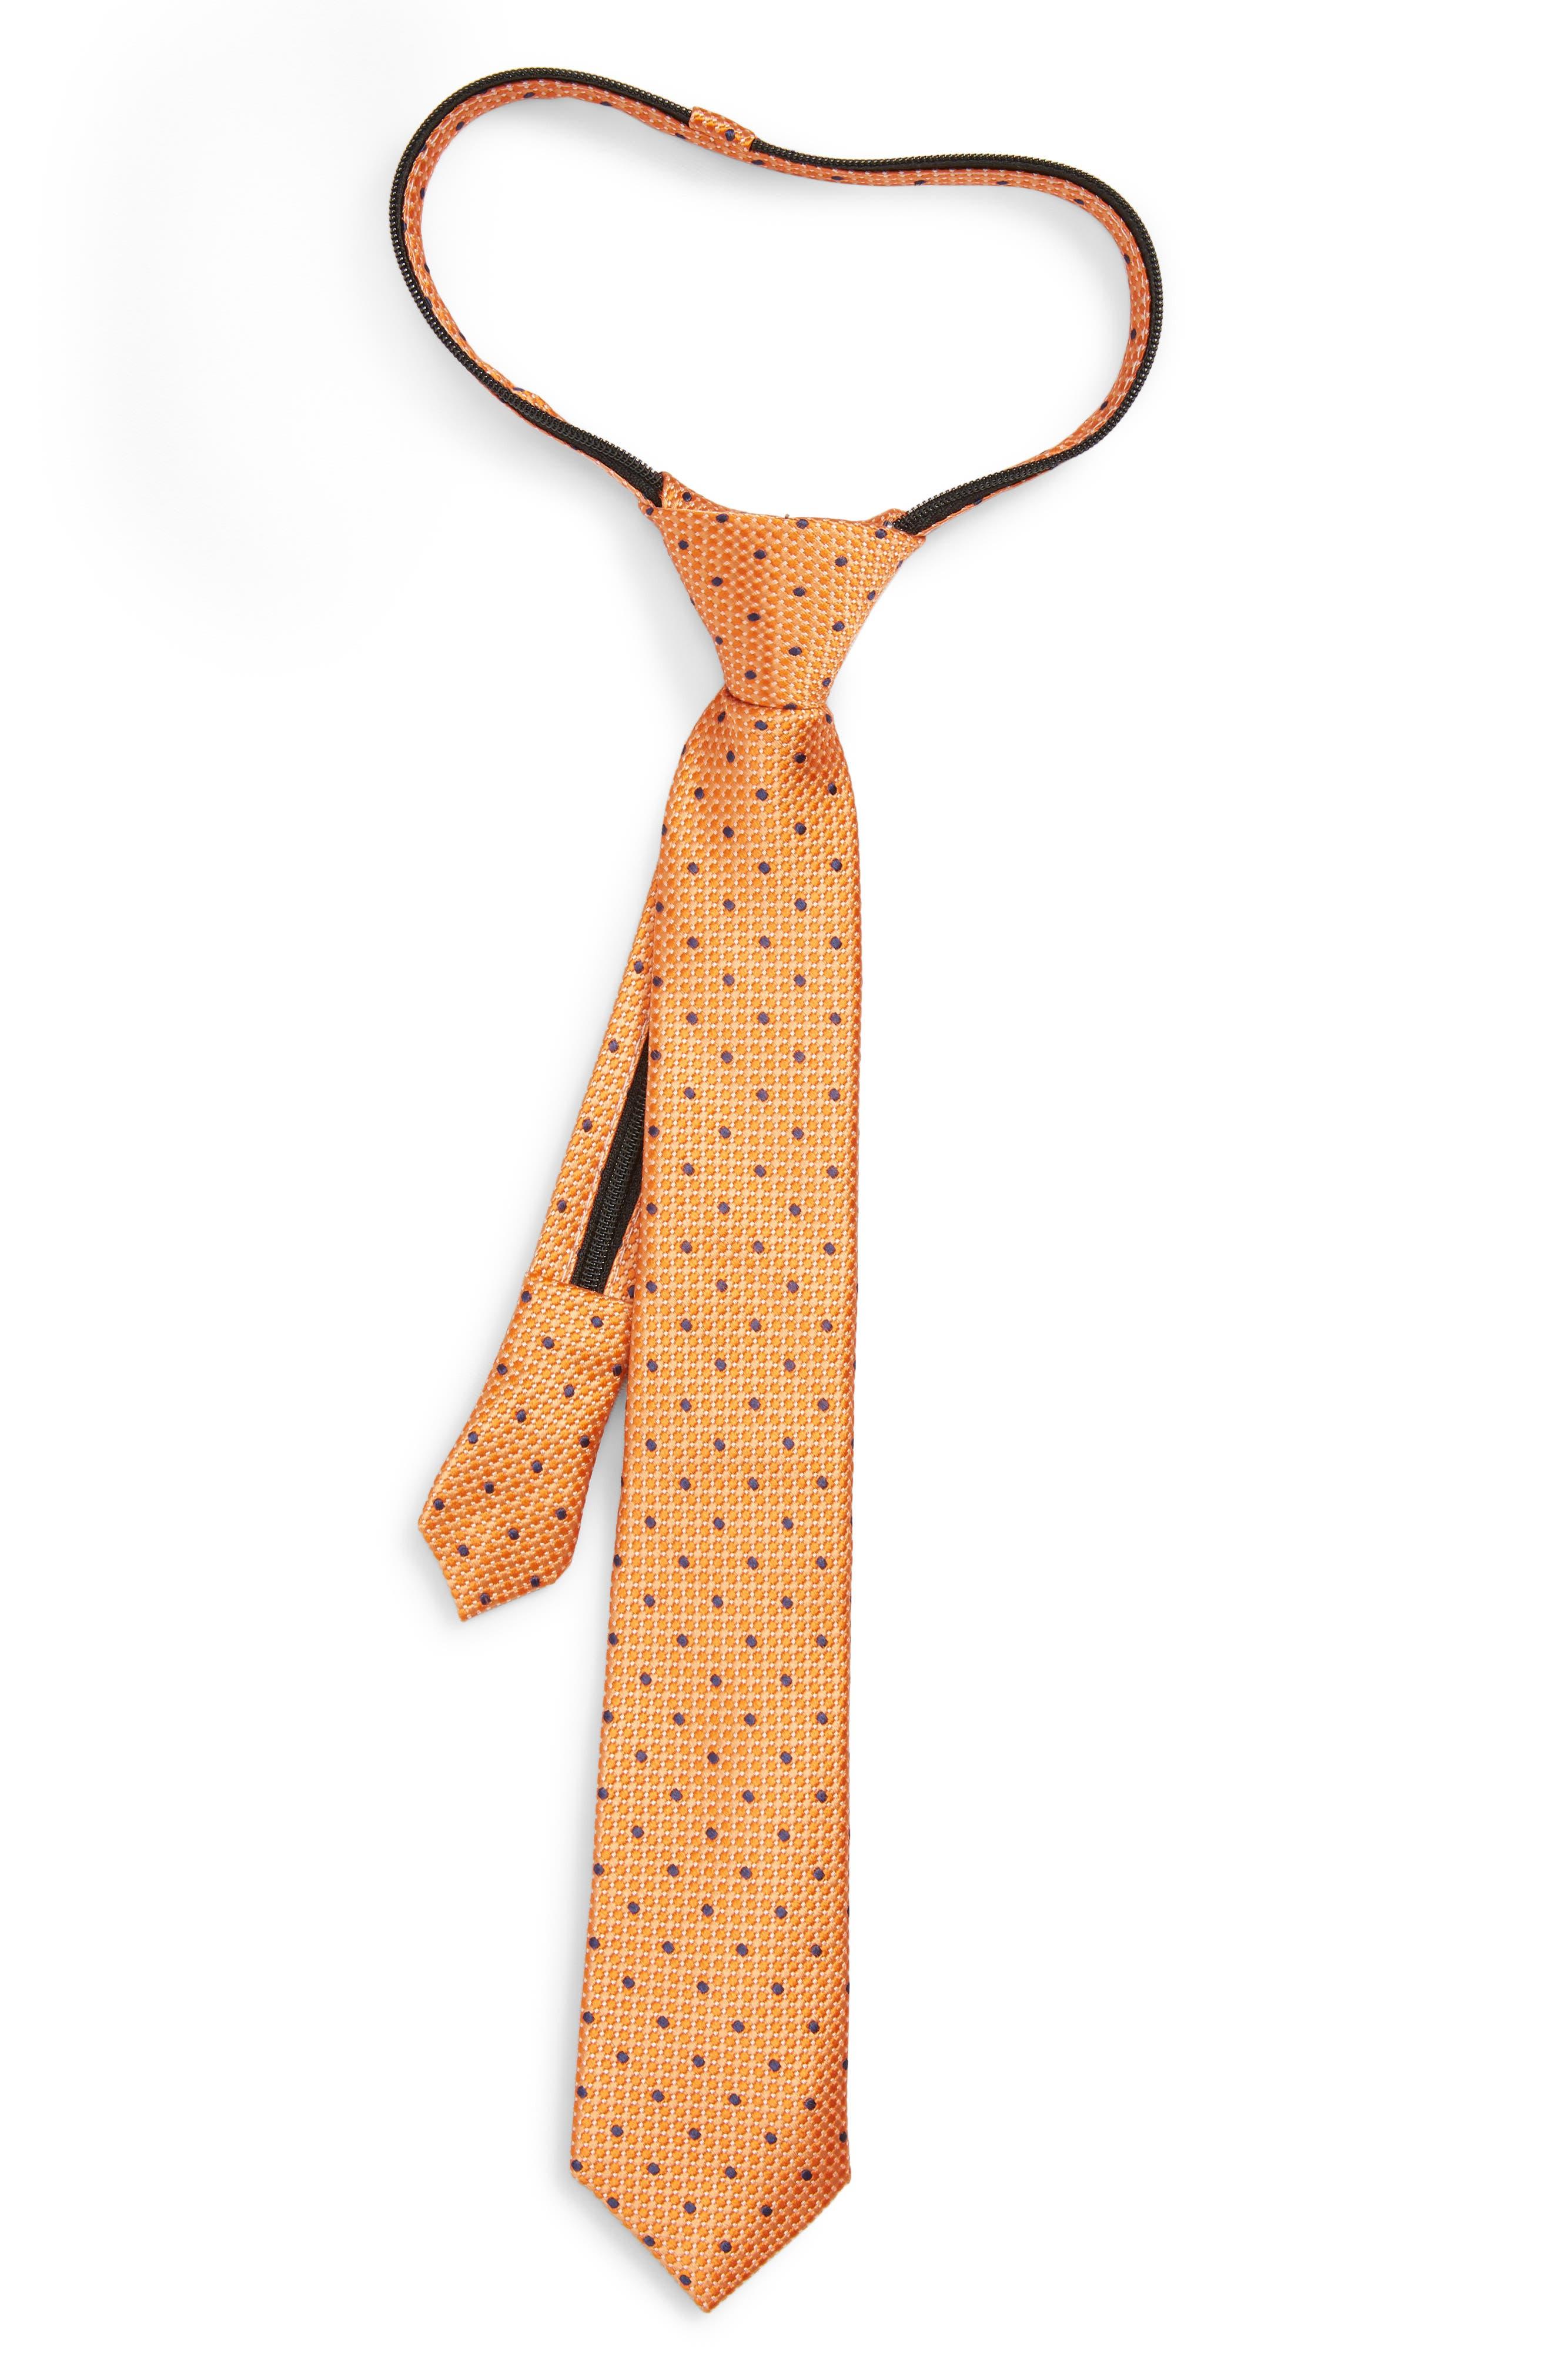 Dot Silk Zip Tie,                             Main thumbnail 1, color,                             ORANGE